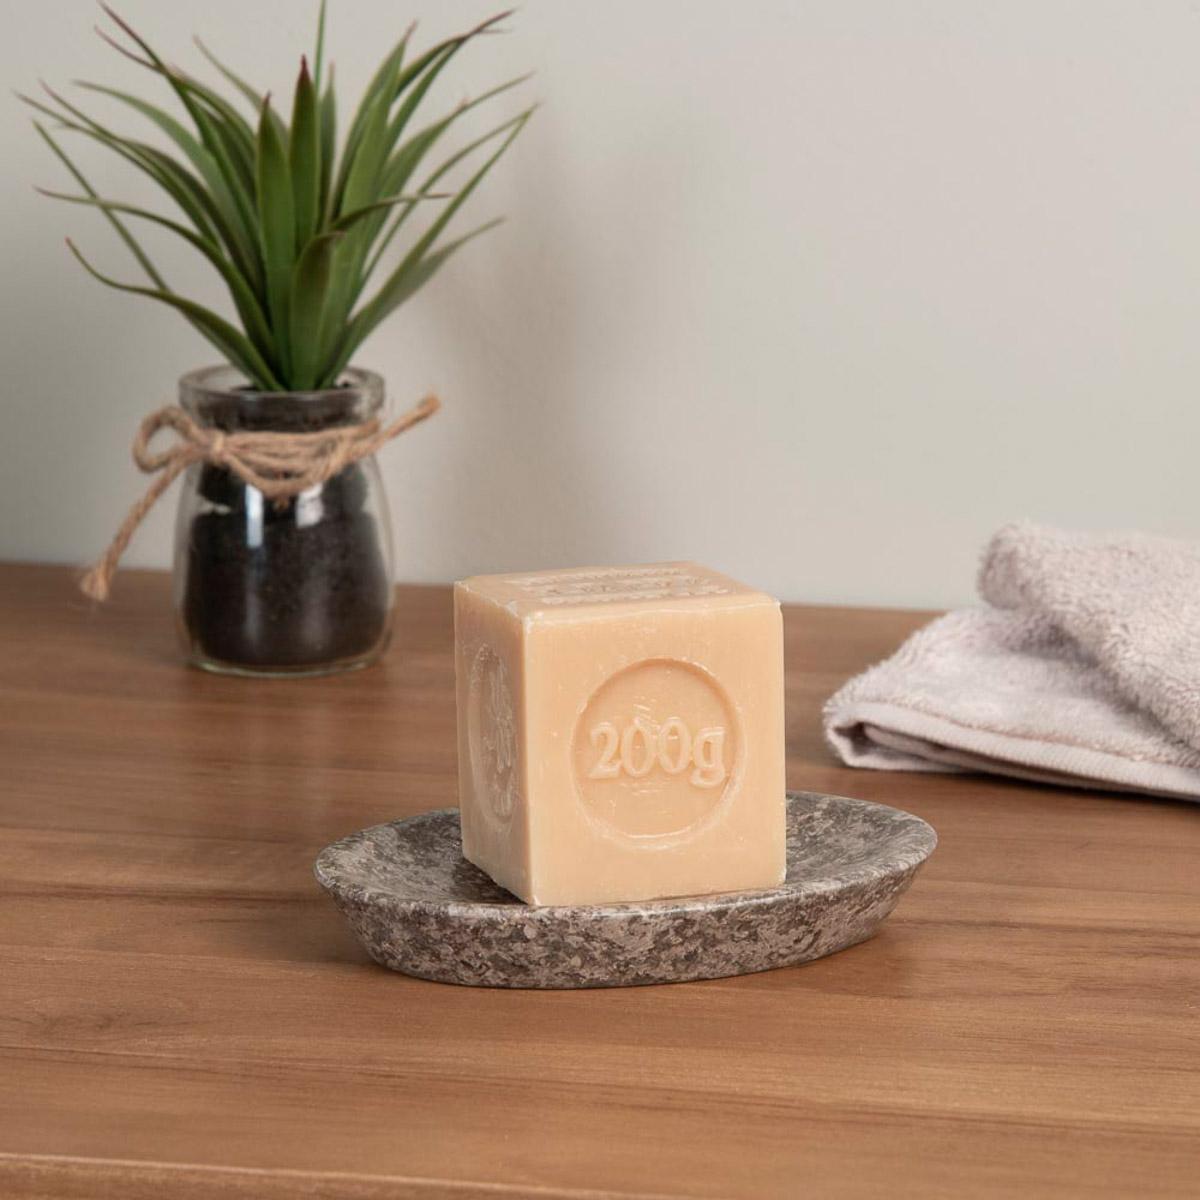 Porte savon de salle de bain en marbre gris h 16 cm for Porte savon salle bain rouge